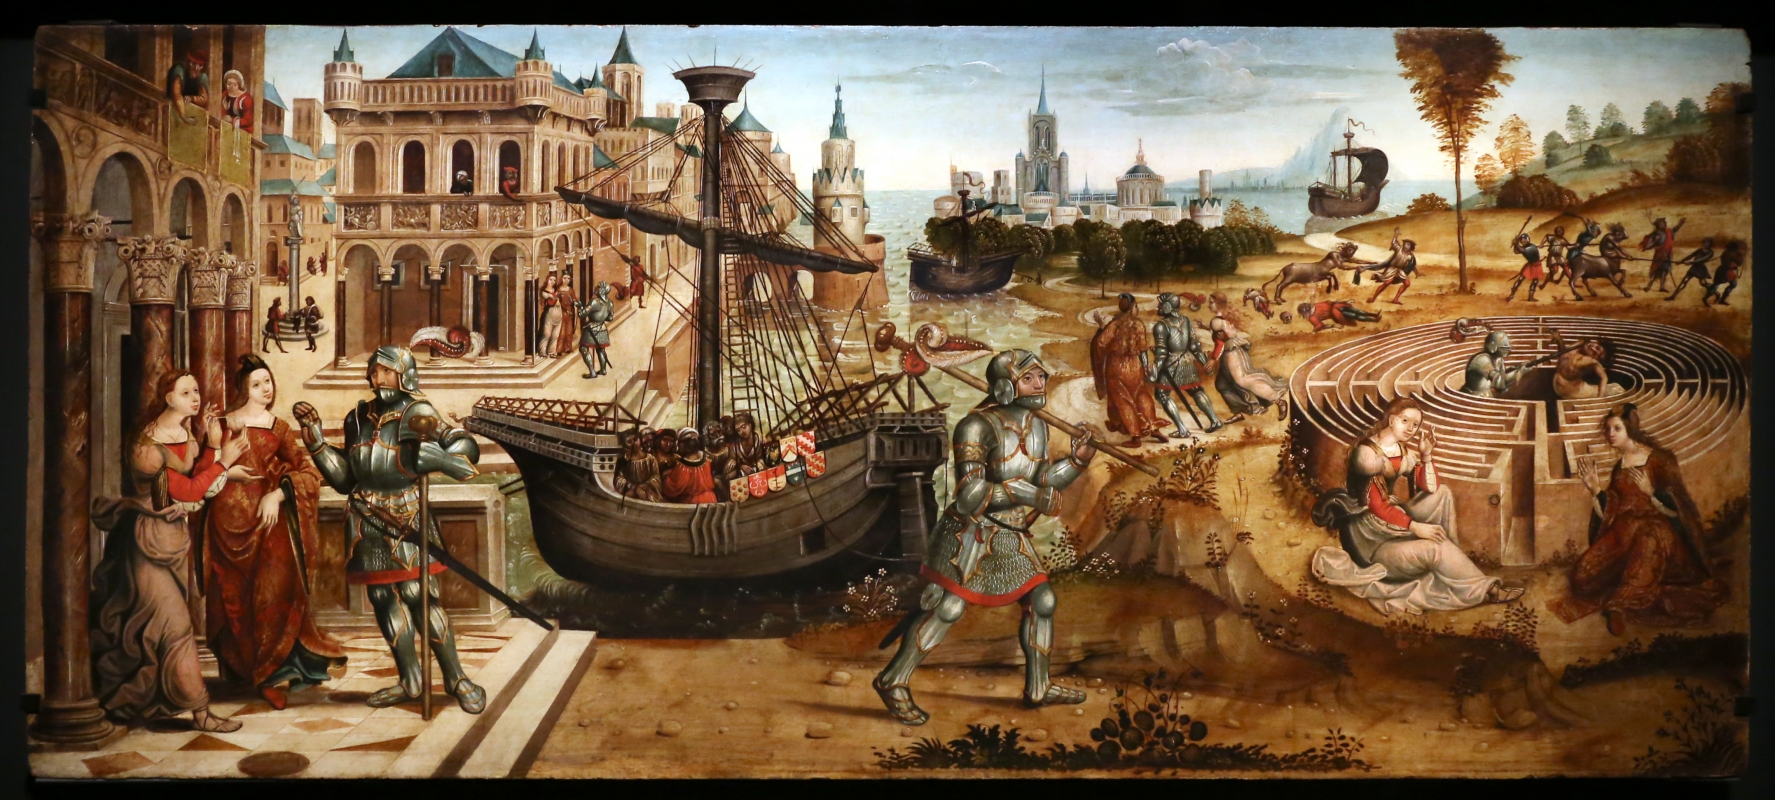 Maestro dei cassoni campana, teseo e il minotauro, 1510-15 ca. (avignone, petit palais) 01 - Sailko - Ferrara (FE)